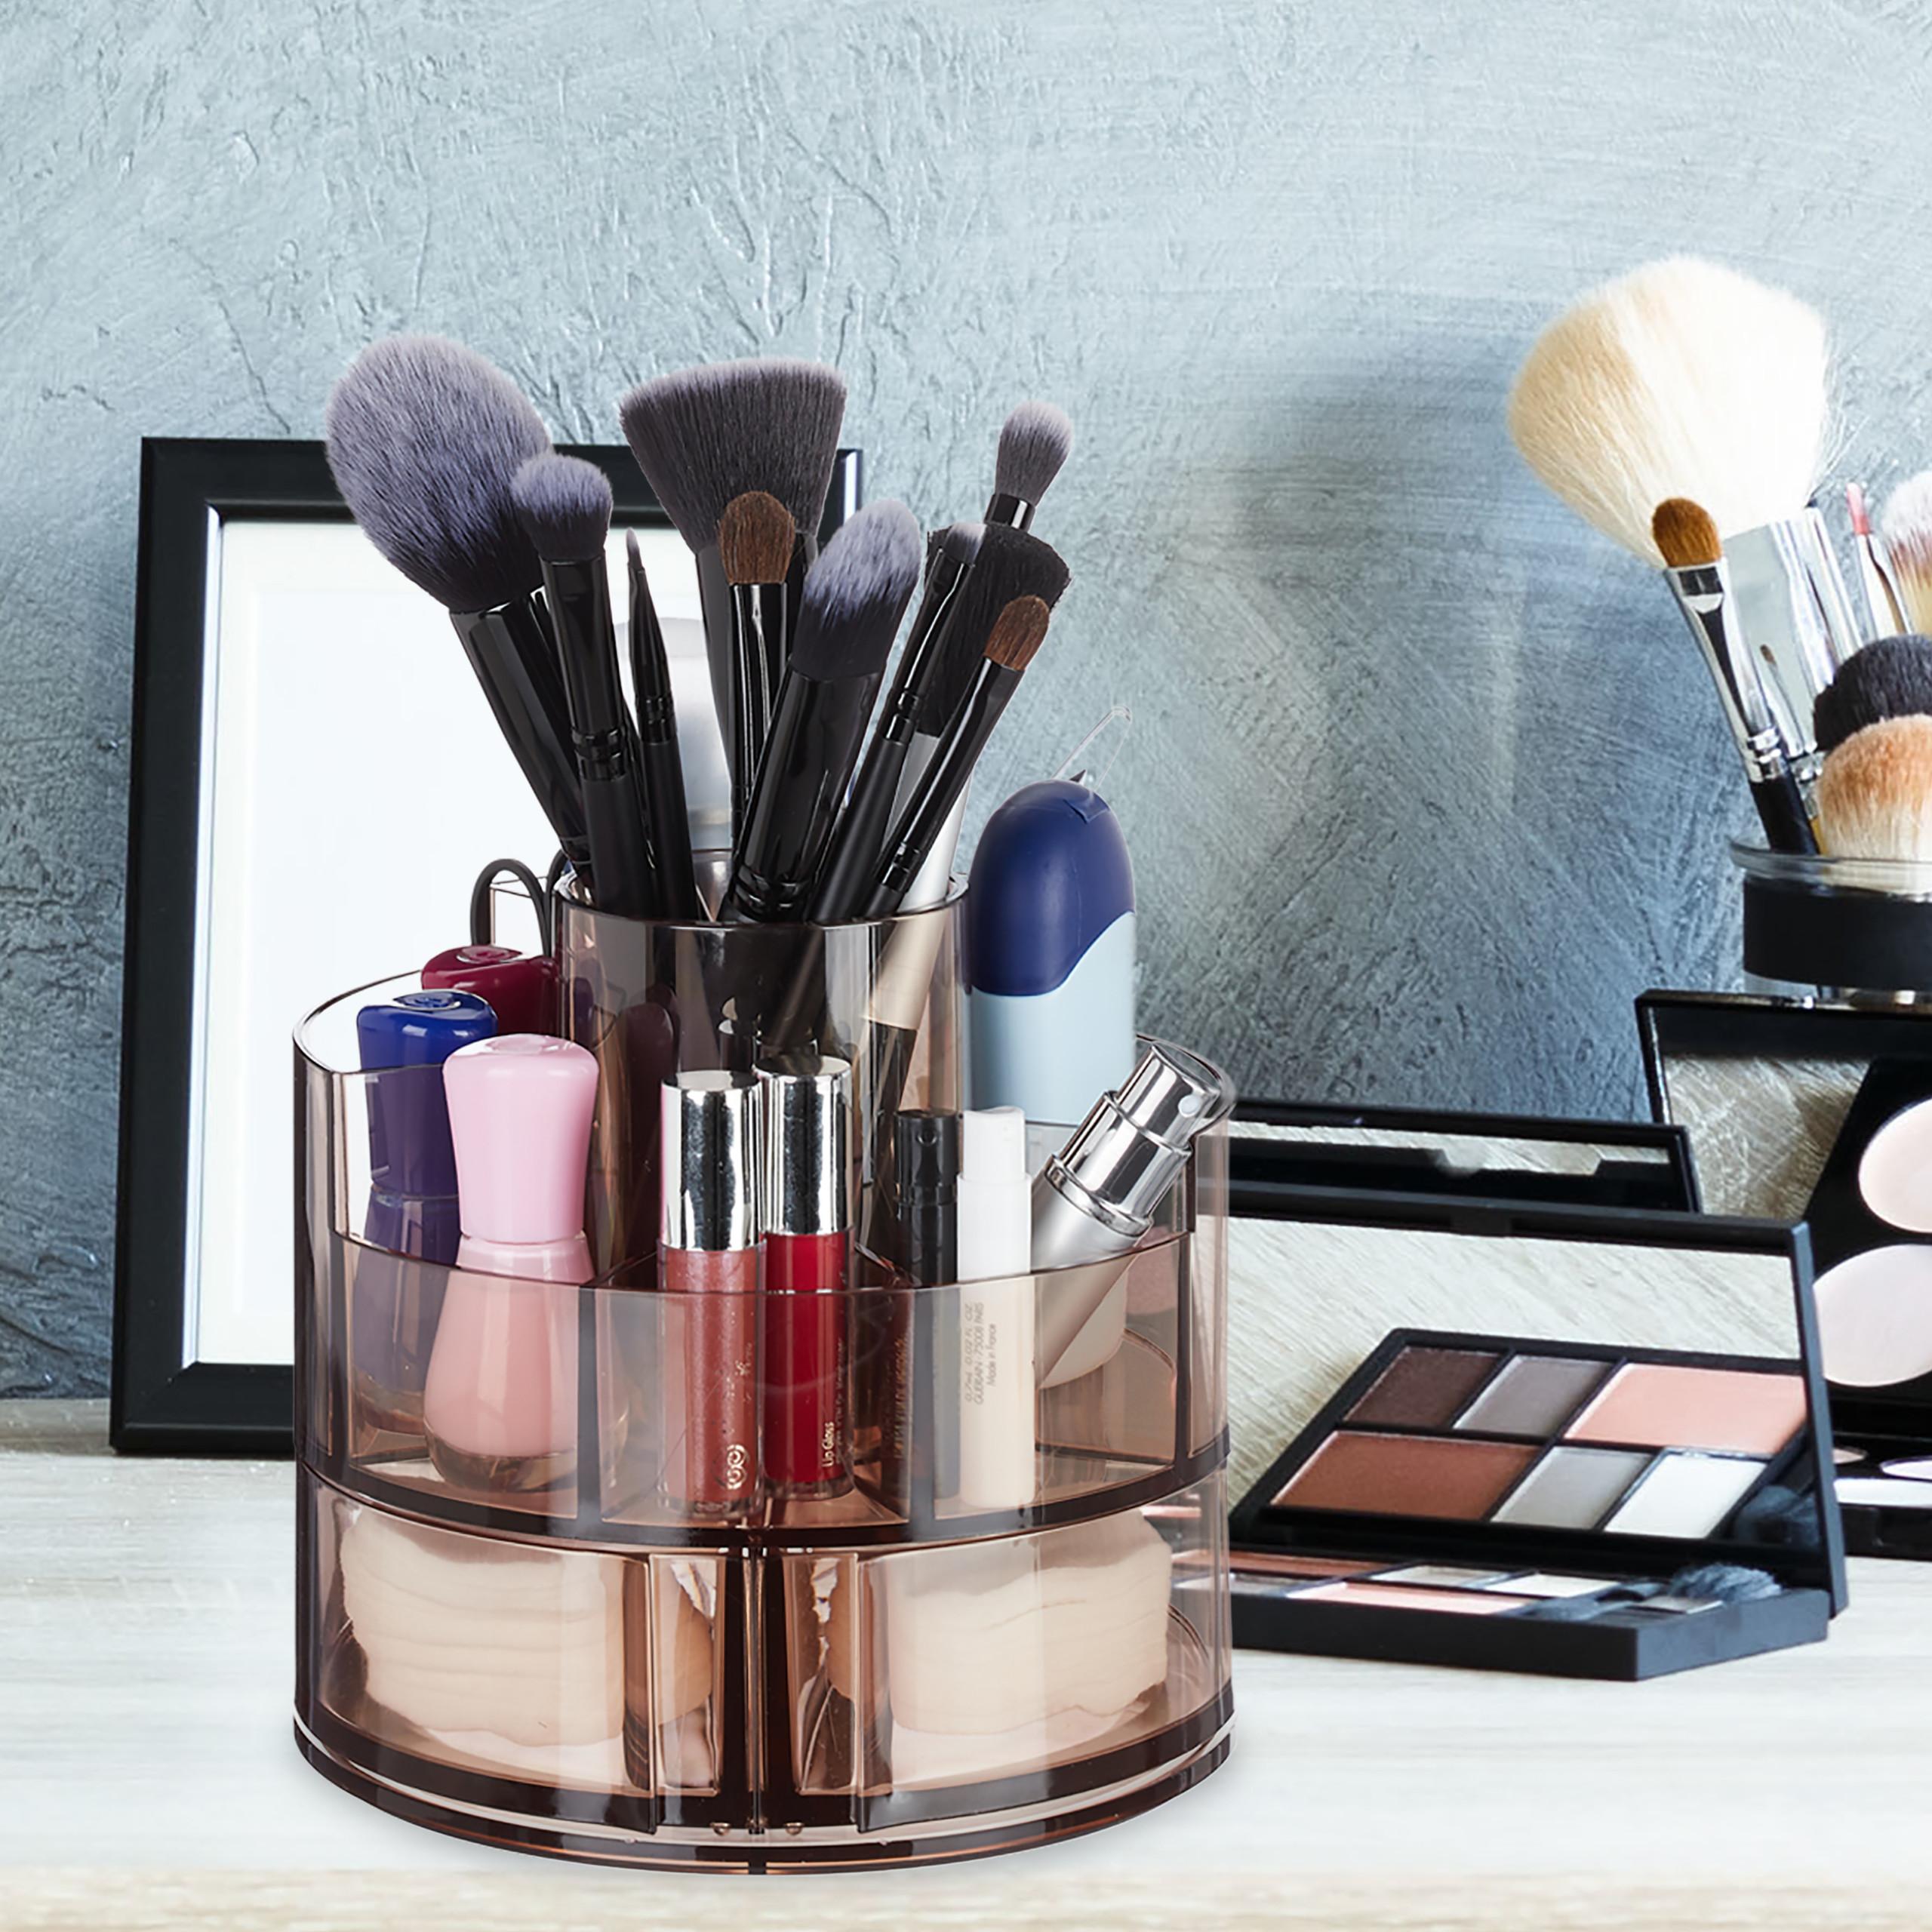 make-up-organizer-acryl-rond-cosmetica-opbergen-opbergsysteem miniatuur 5